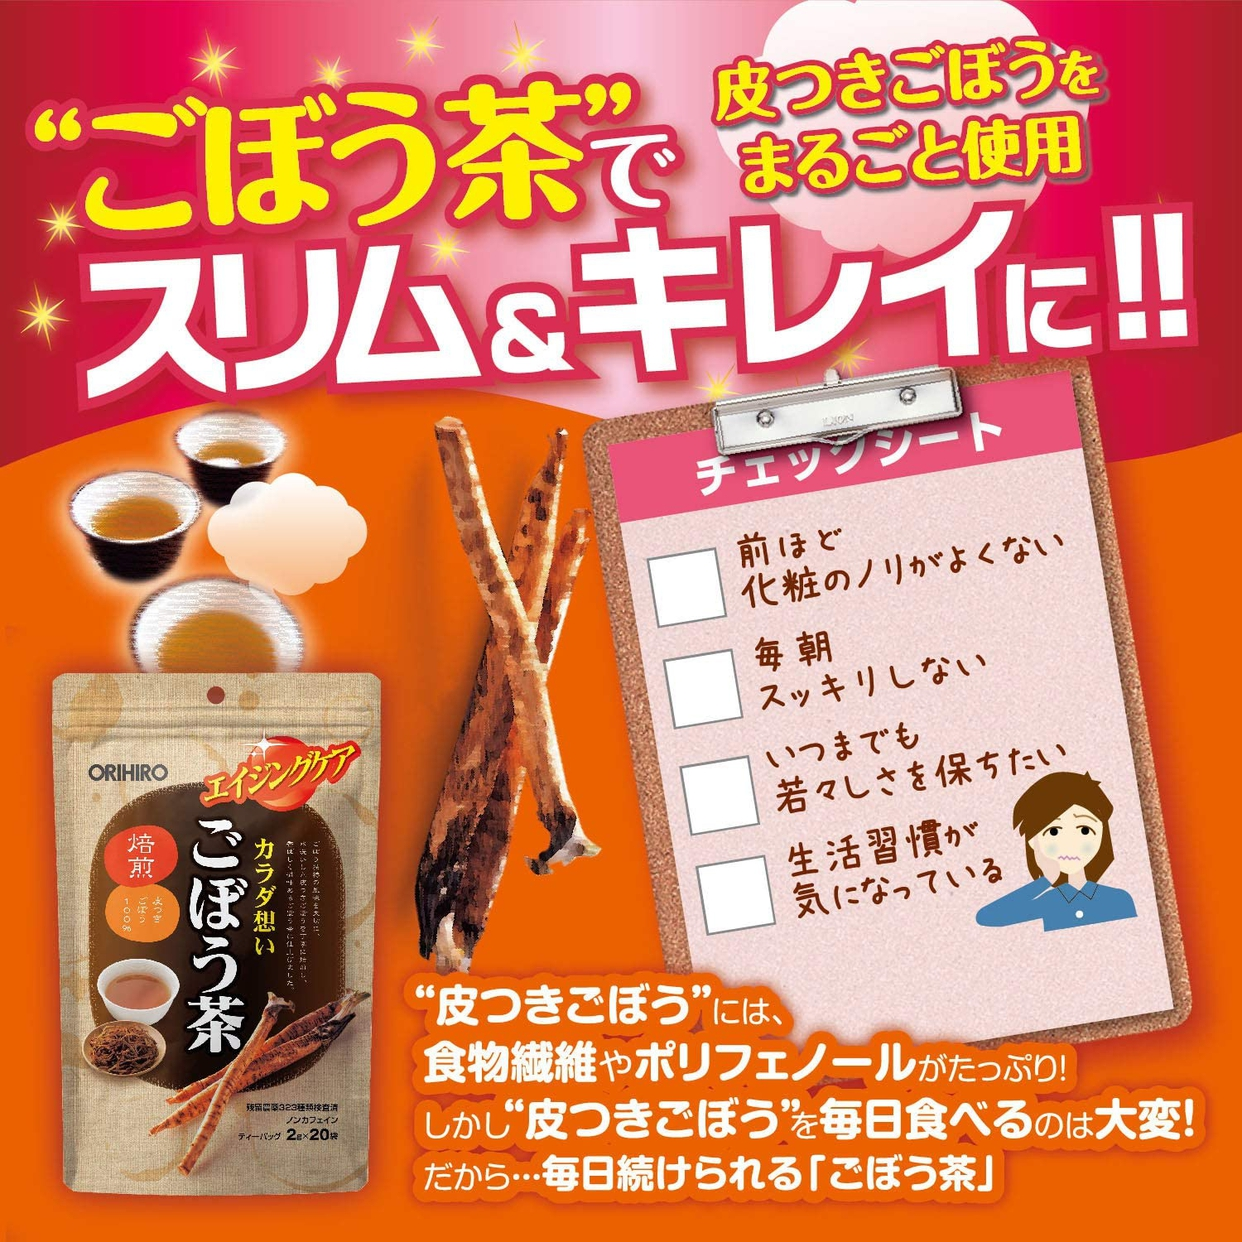 ORIHIRO(オリヒロ) ごぼう茶の商品画像3